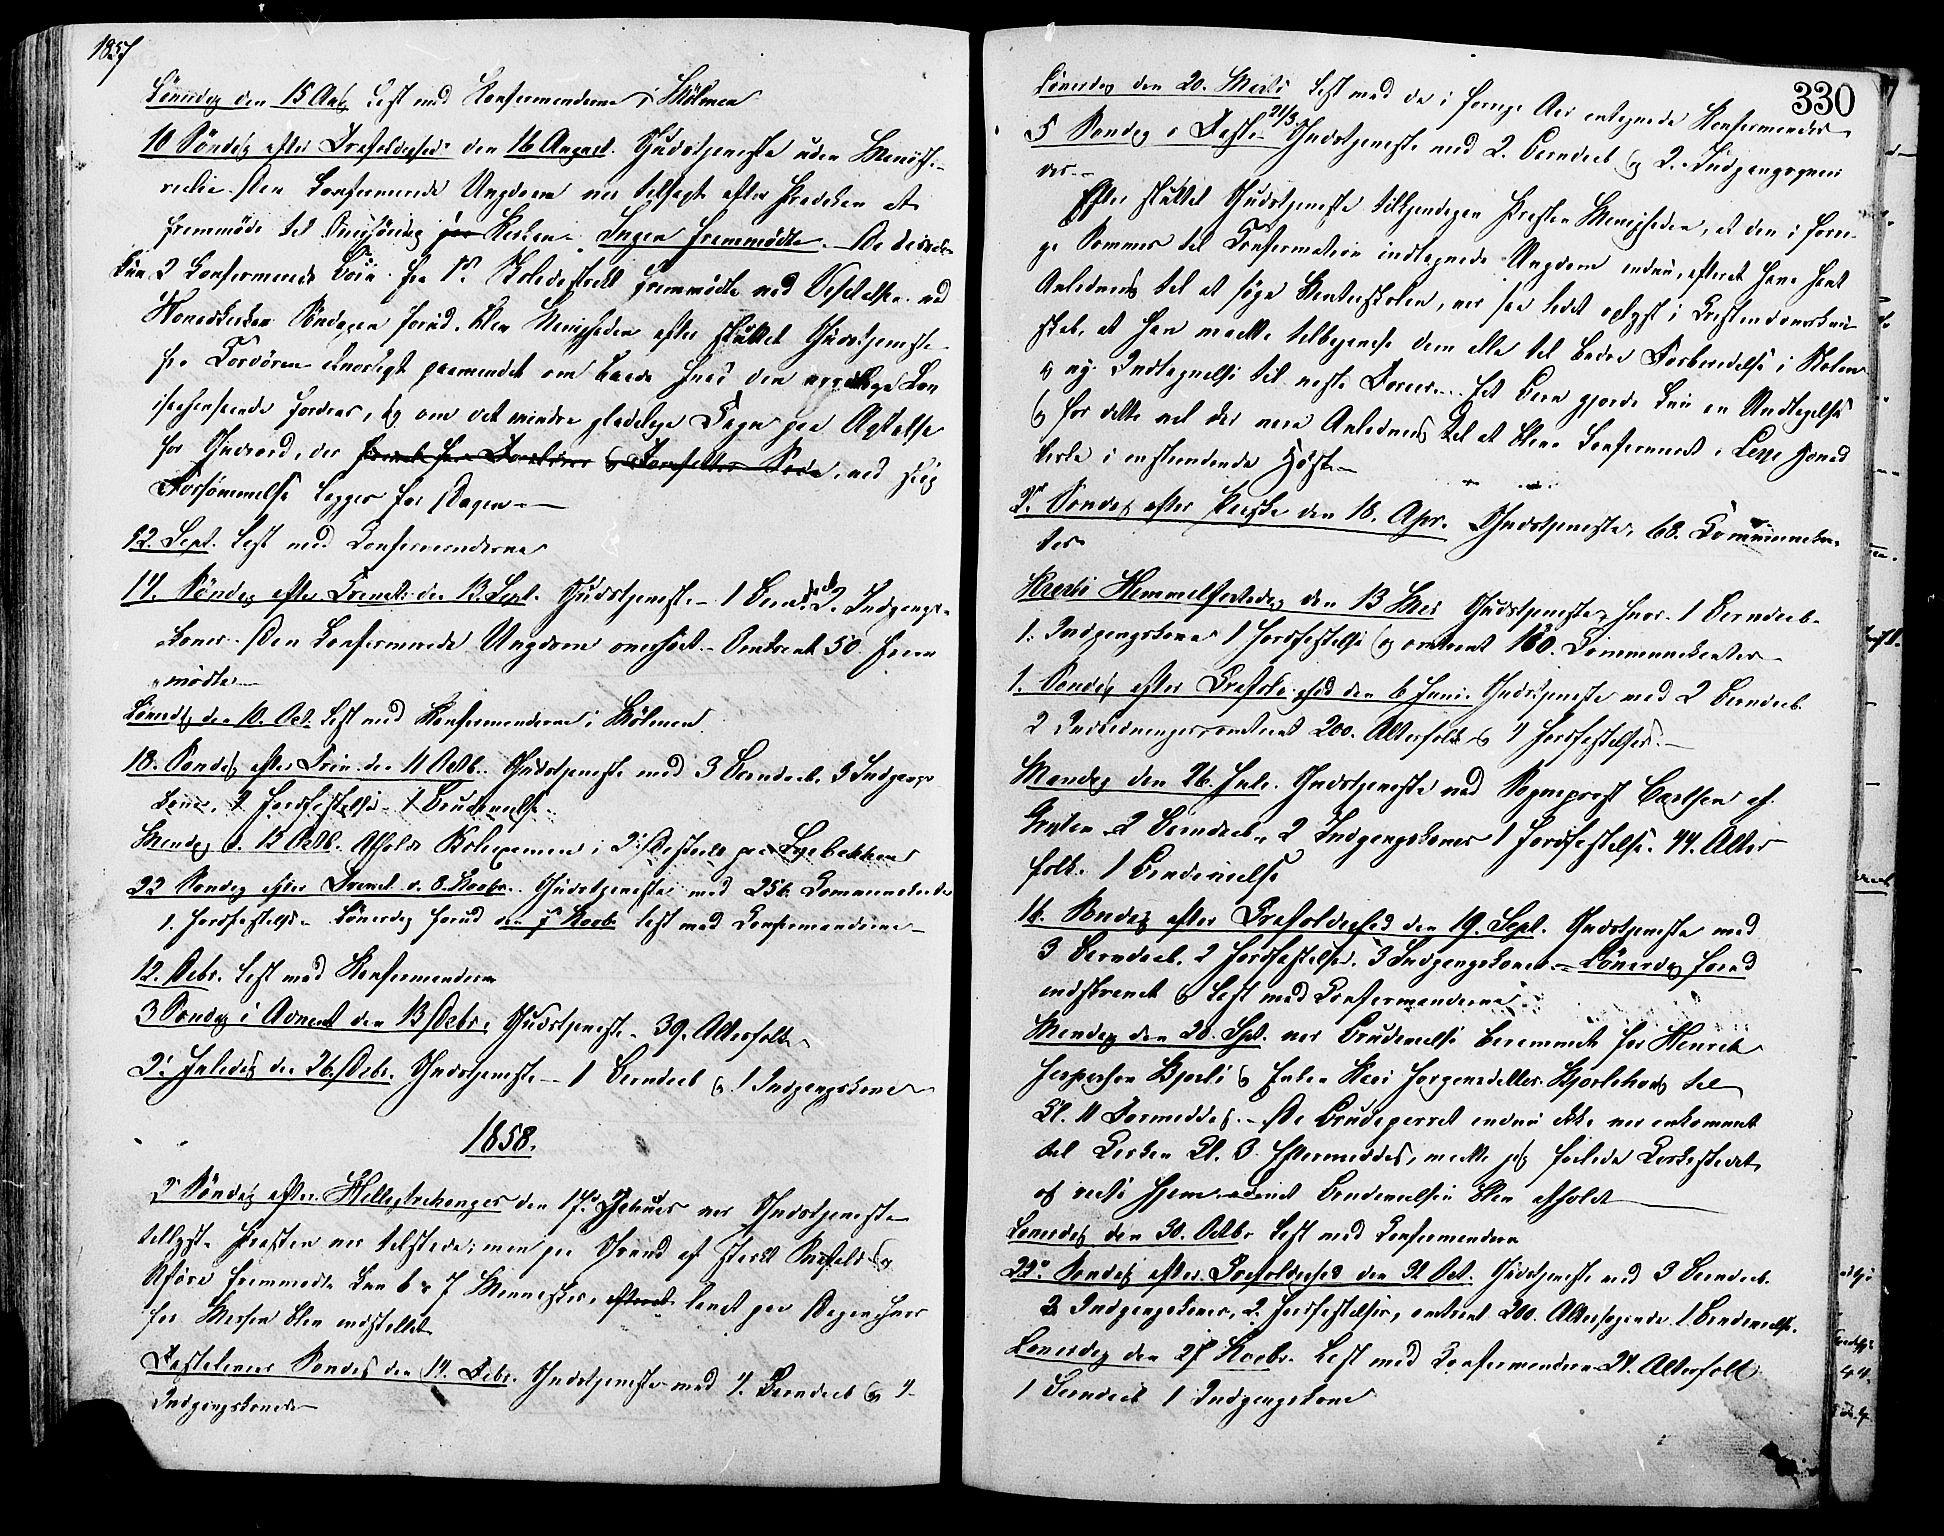 SAH, Lesja prestekontor, Ministerialbok nr. 9, 1854-1889, s. 330